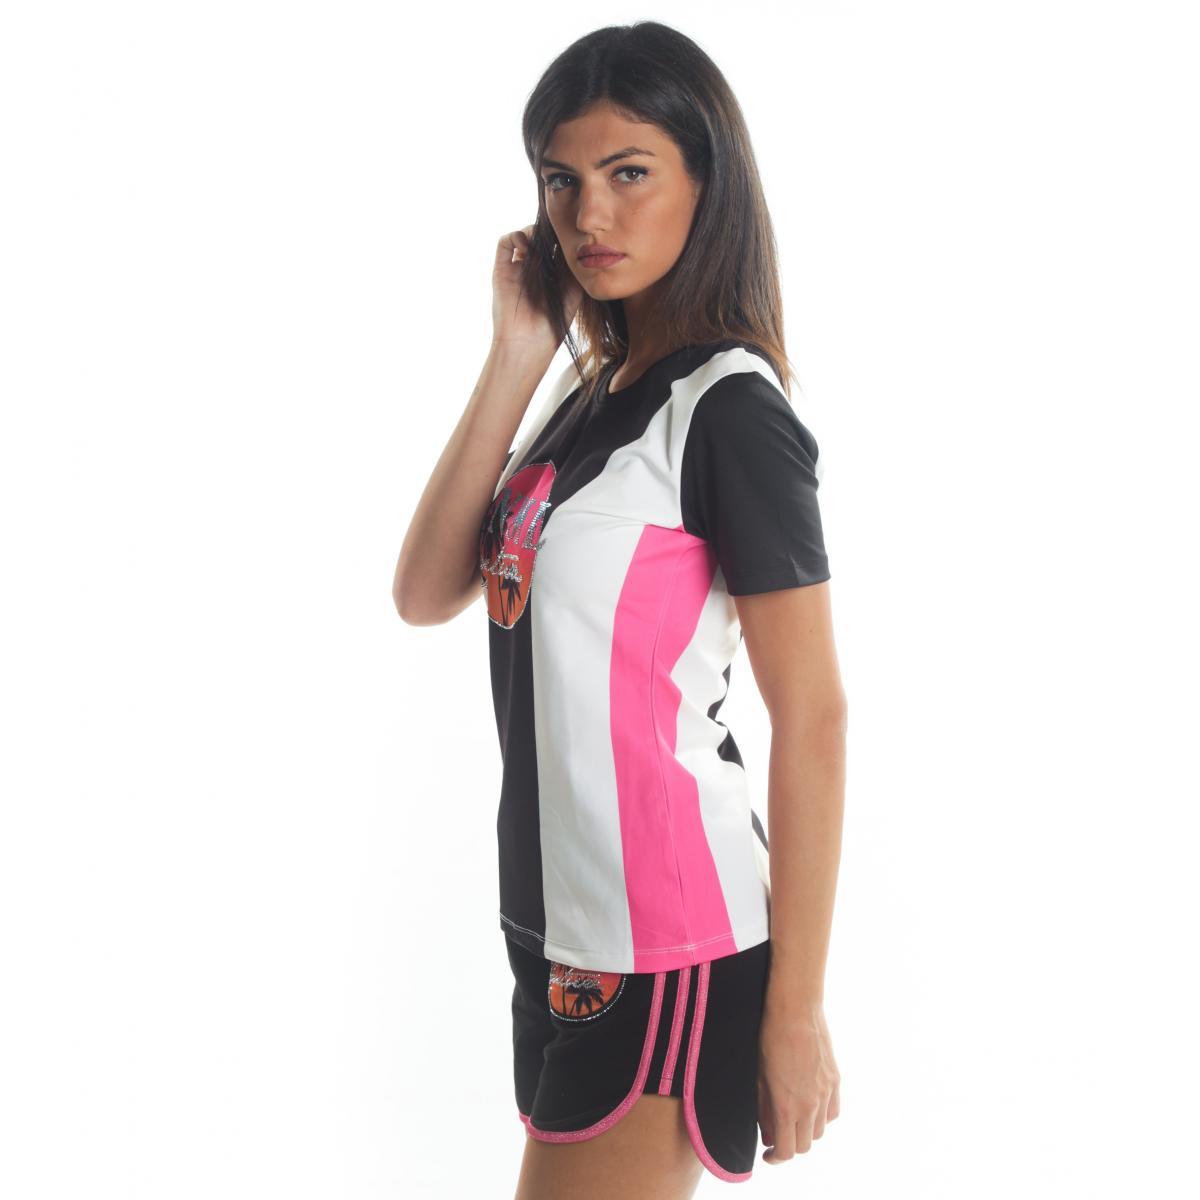 T-shirt MINIMAL con bande a contrasto e stampa da donna rif. D1679